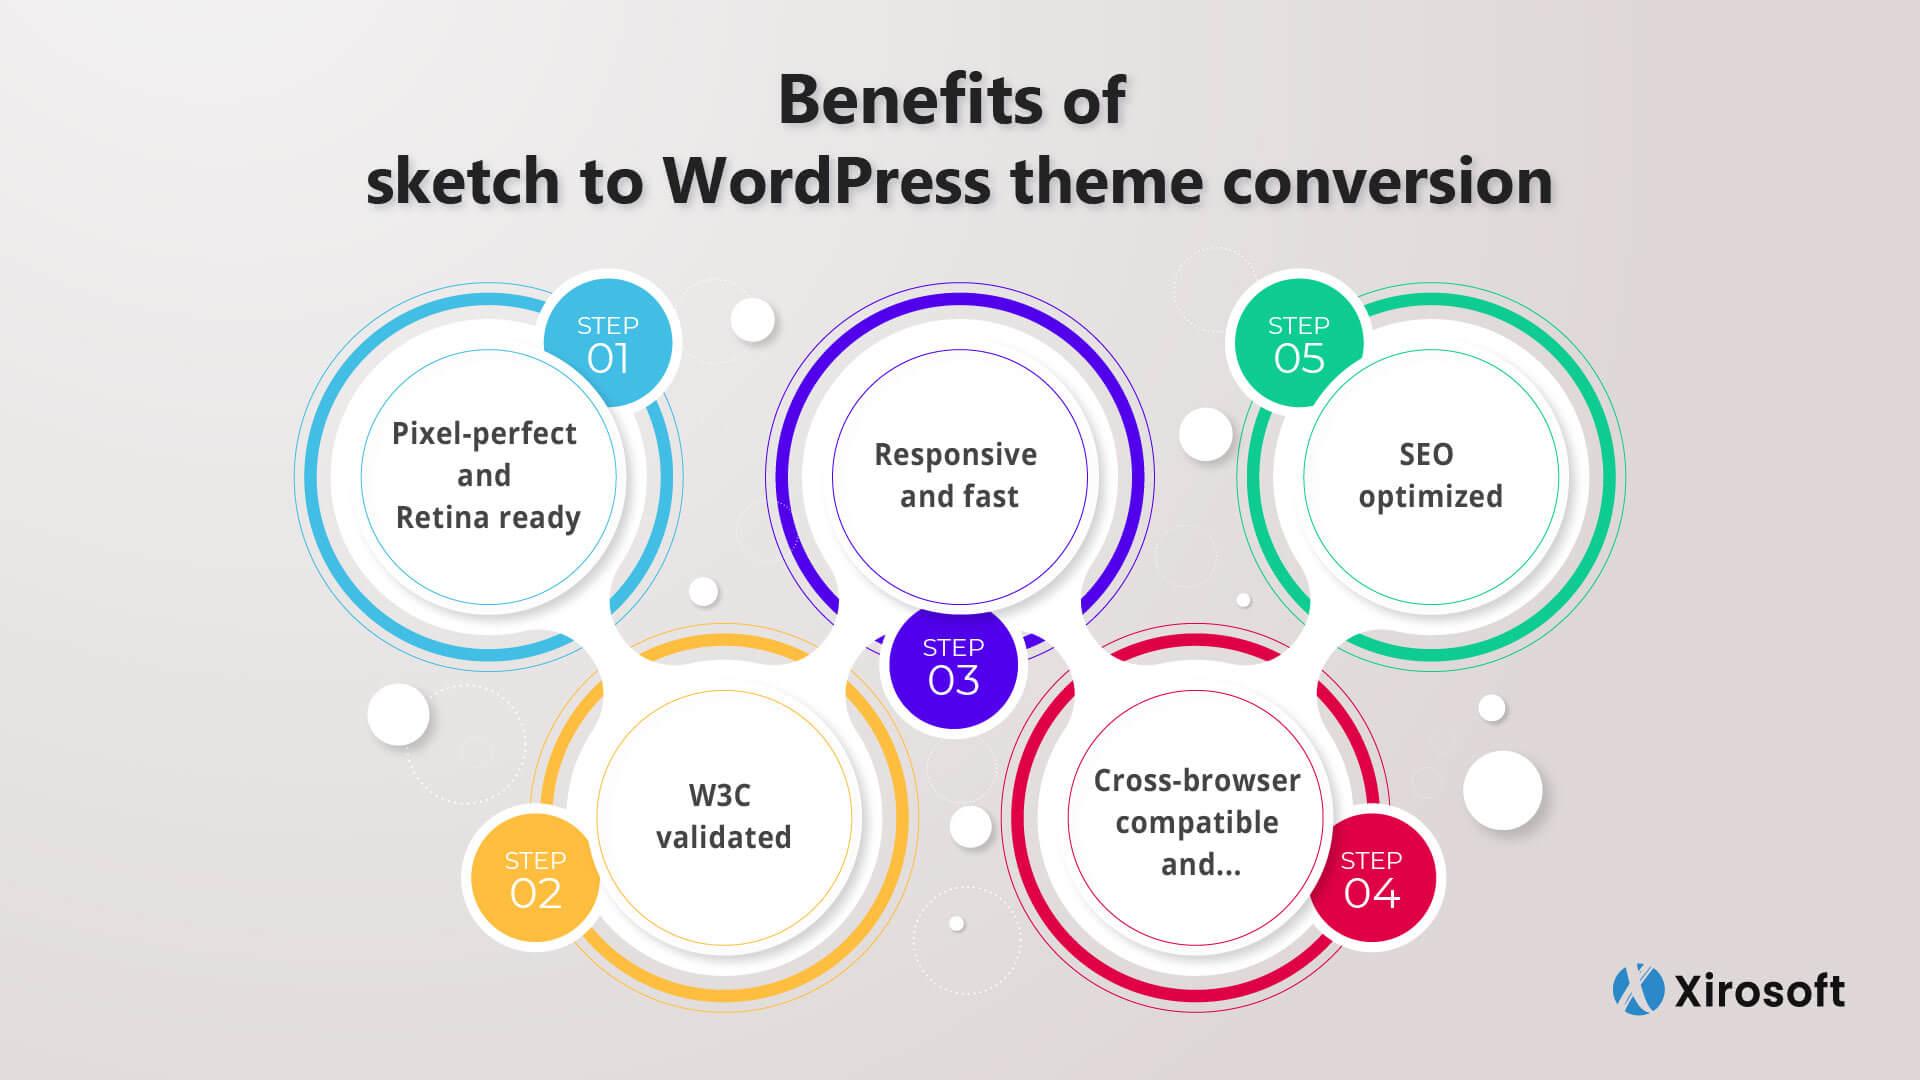 How To Convert Sketch To WordPress Theme: Xirosoft Guide